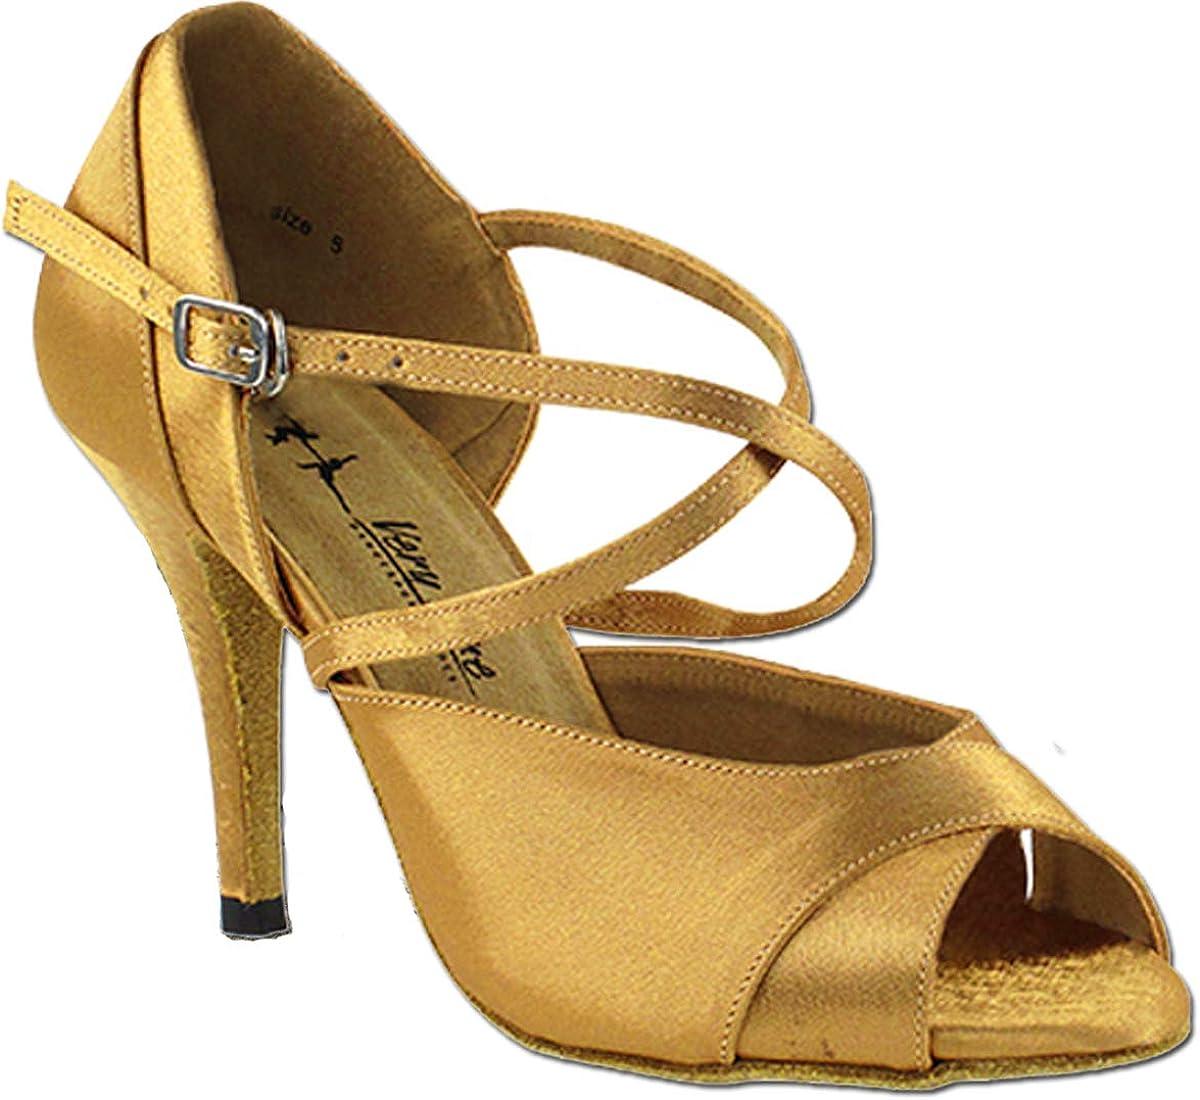 Women's Ballroom Dance Shoes Tango Wedding Party Latin Salsa Dance Shoes Brown Satin 2828LEDSSEB Comfortable - Very Fine 3.5